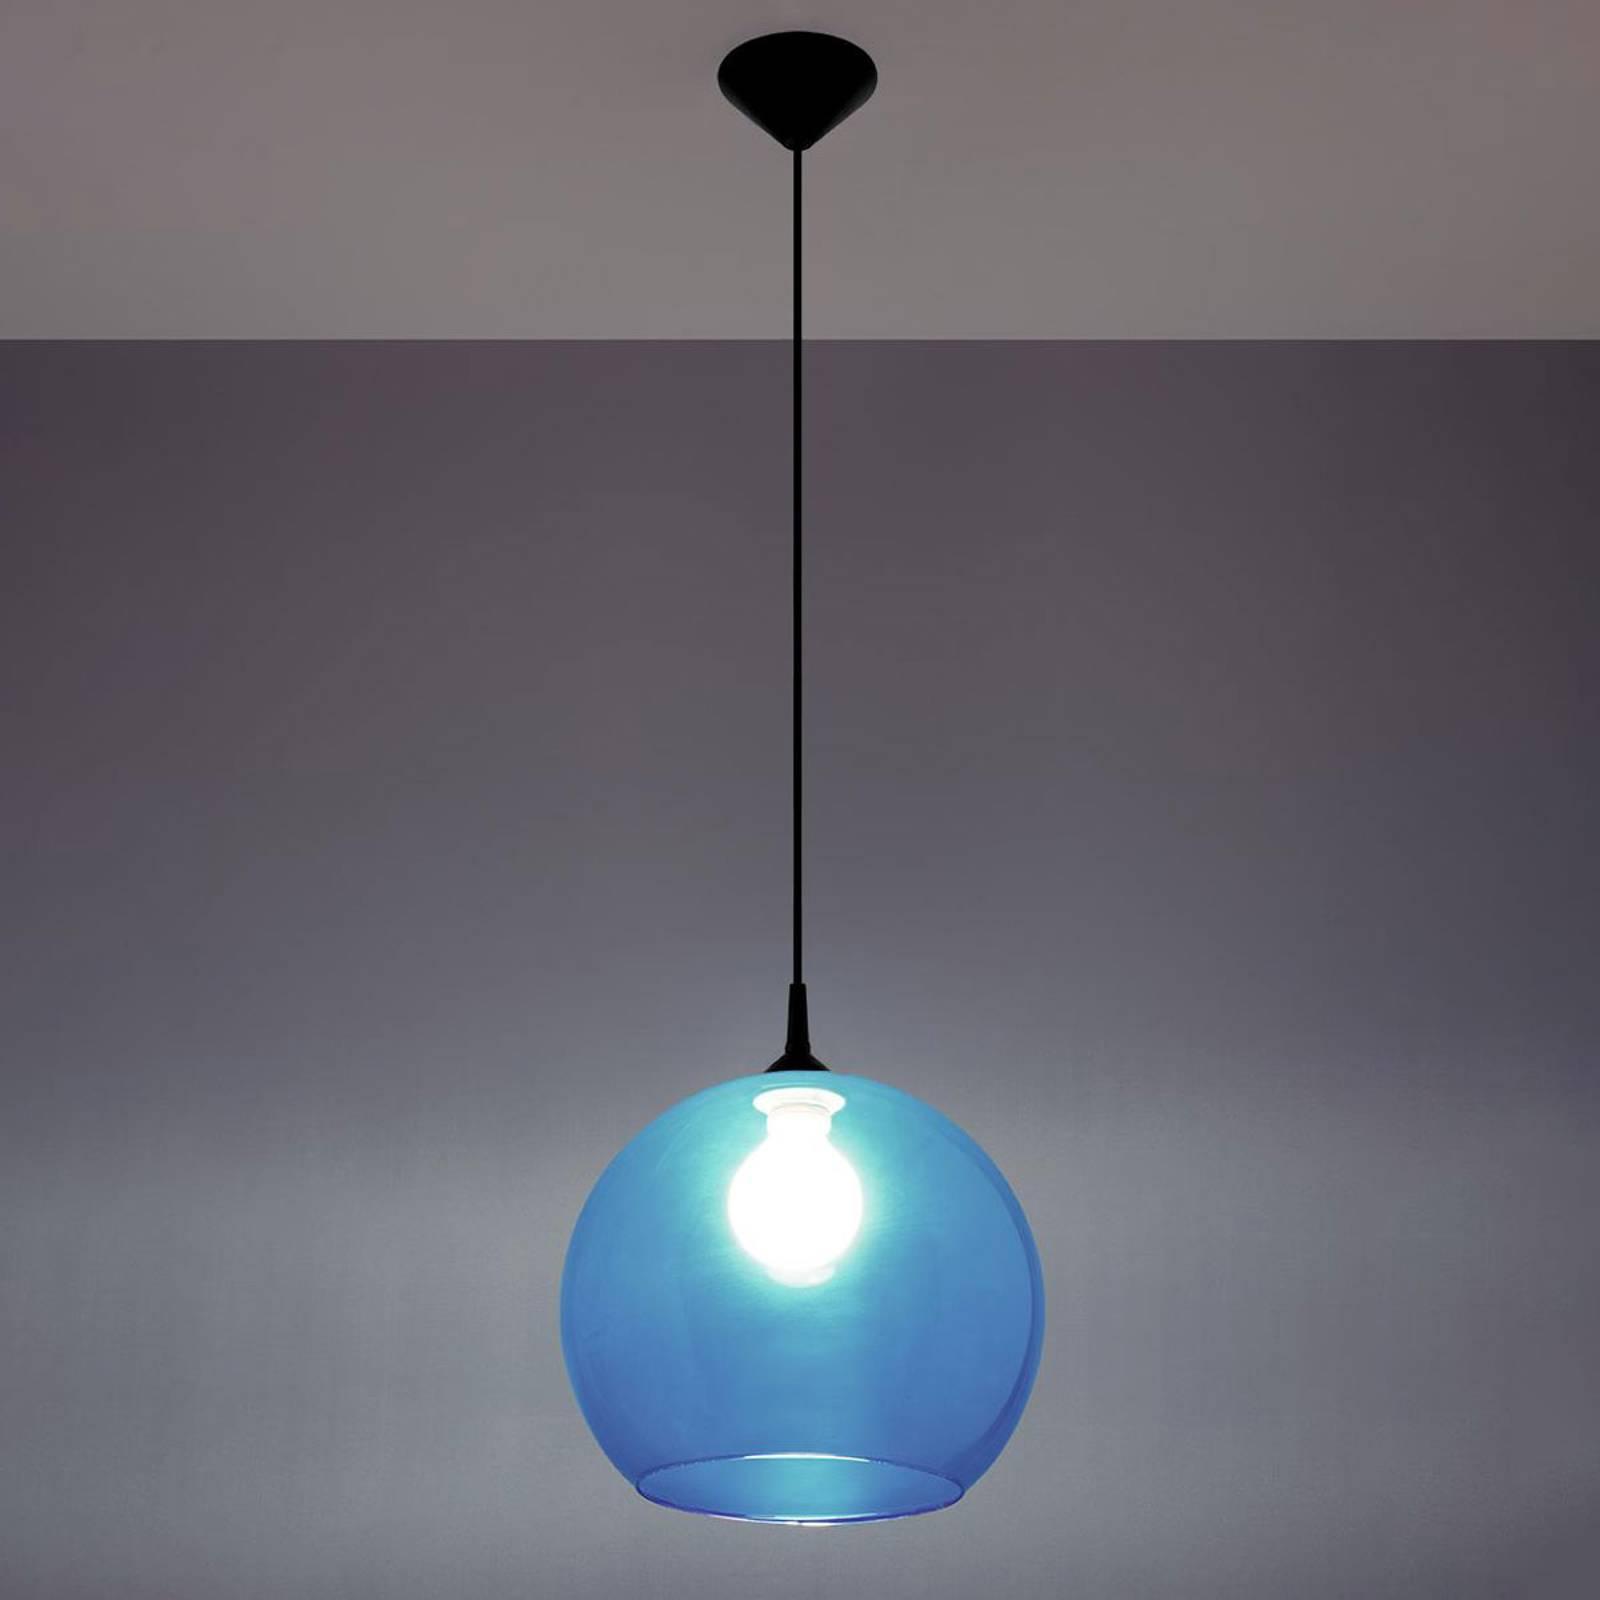 Hanglamp Colour, glazen kap blauw